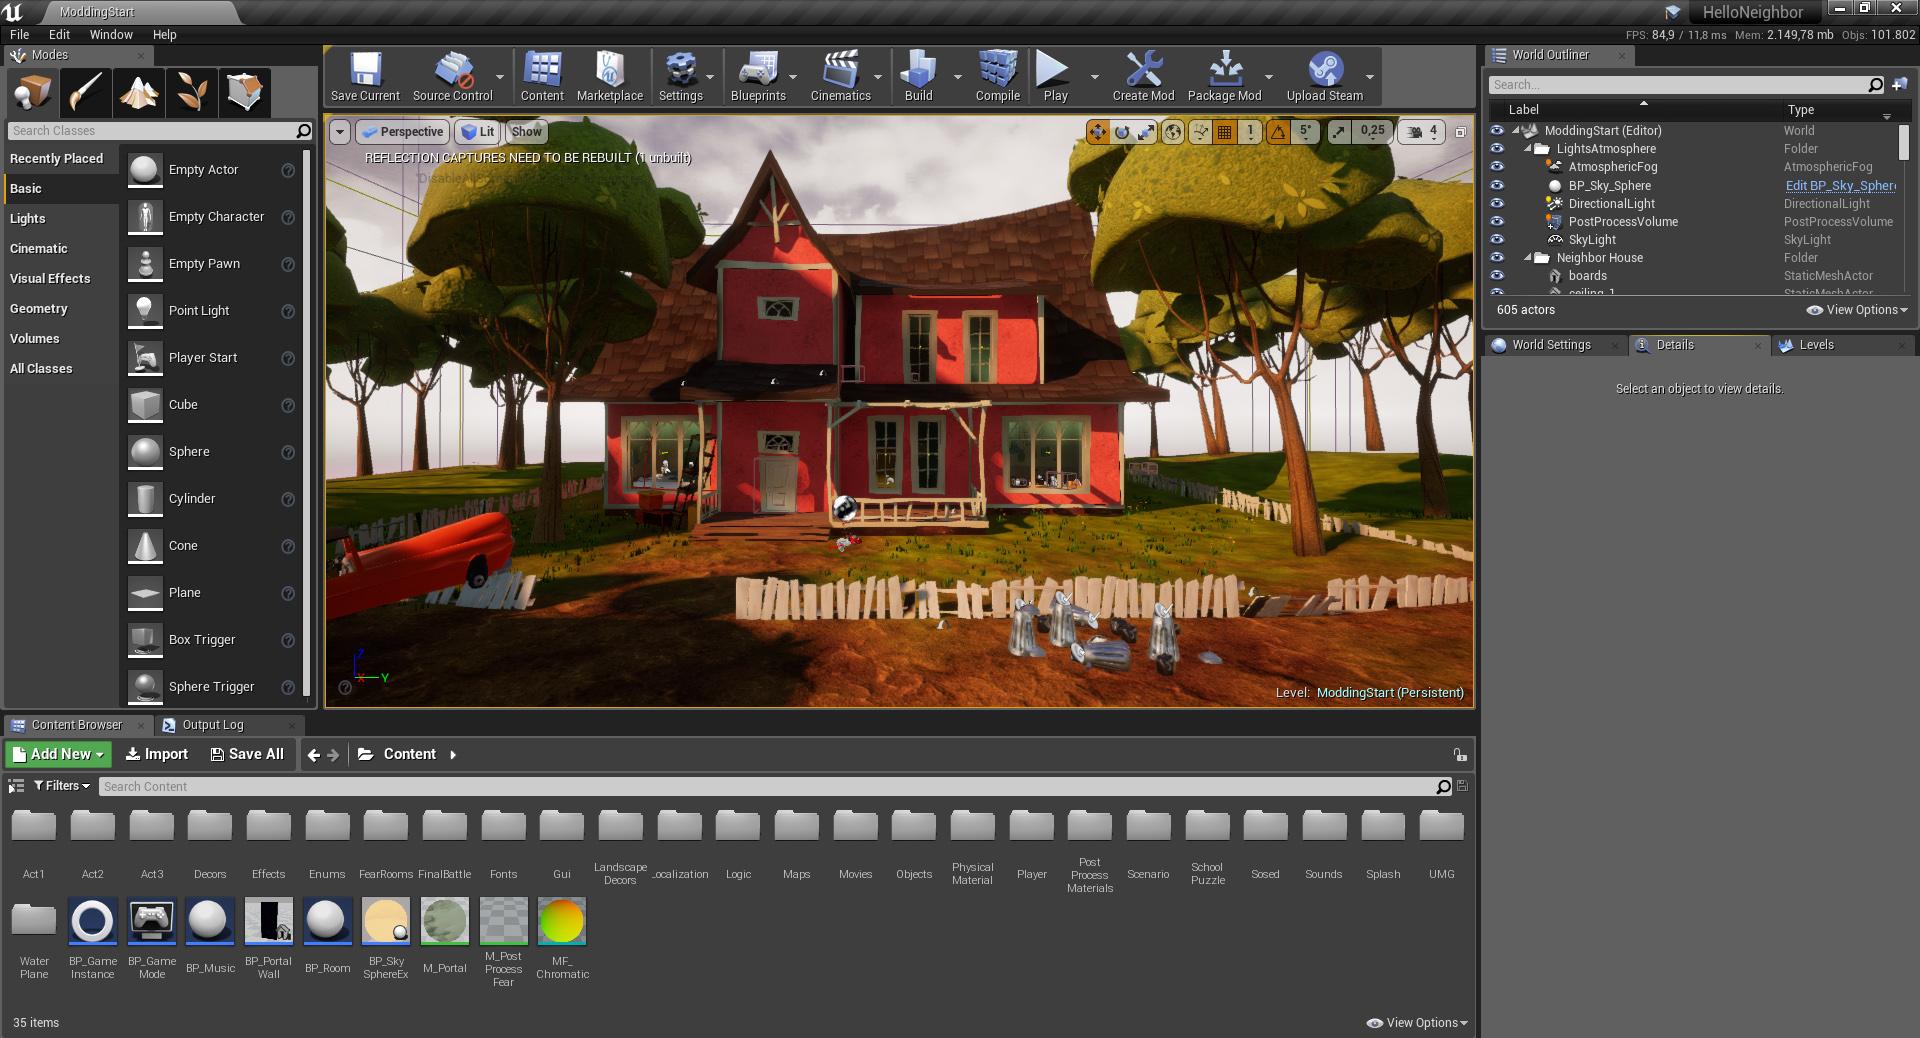 NeighborModKit - Starting Guide tutorial - Unreal Engine 4 Games